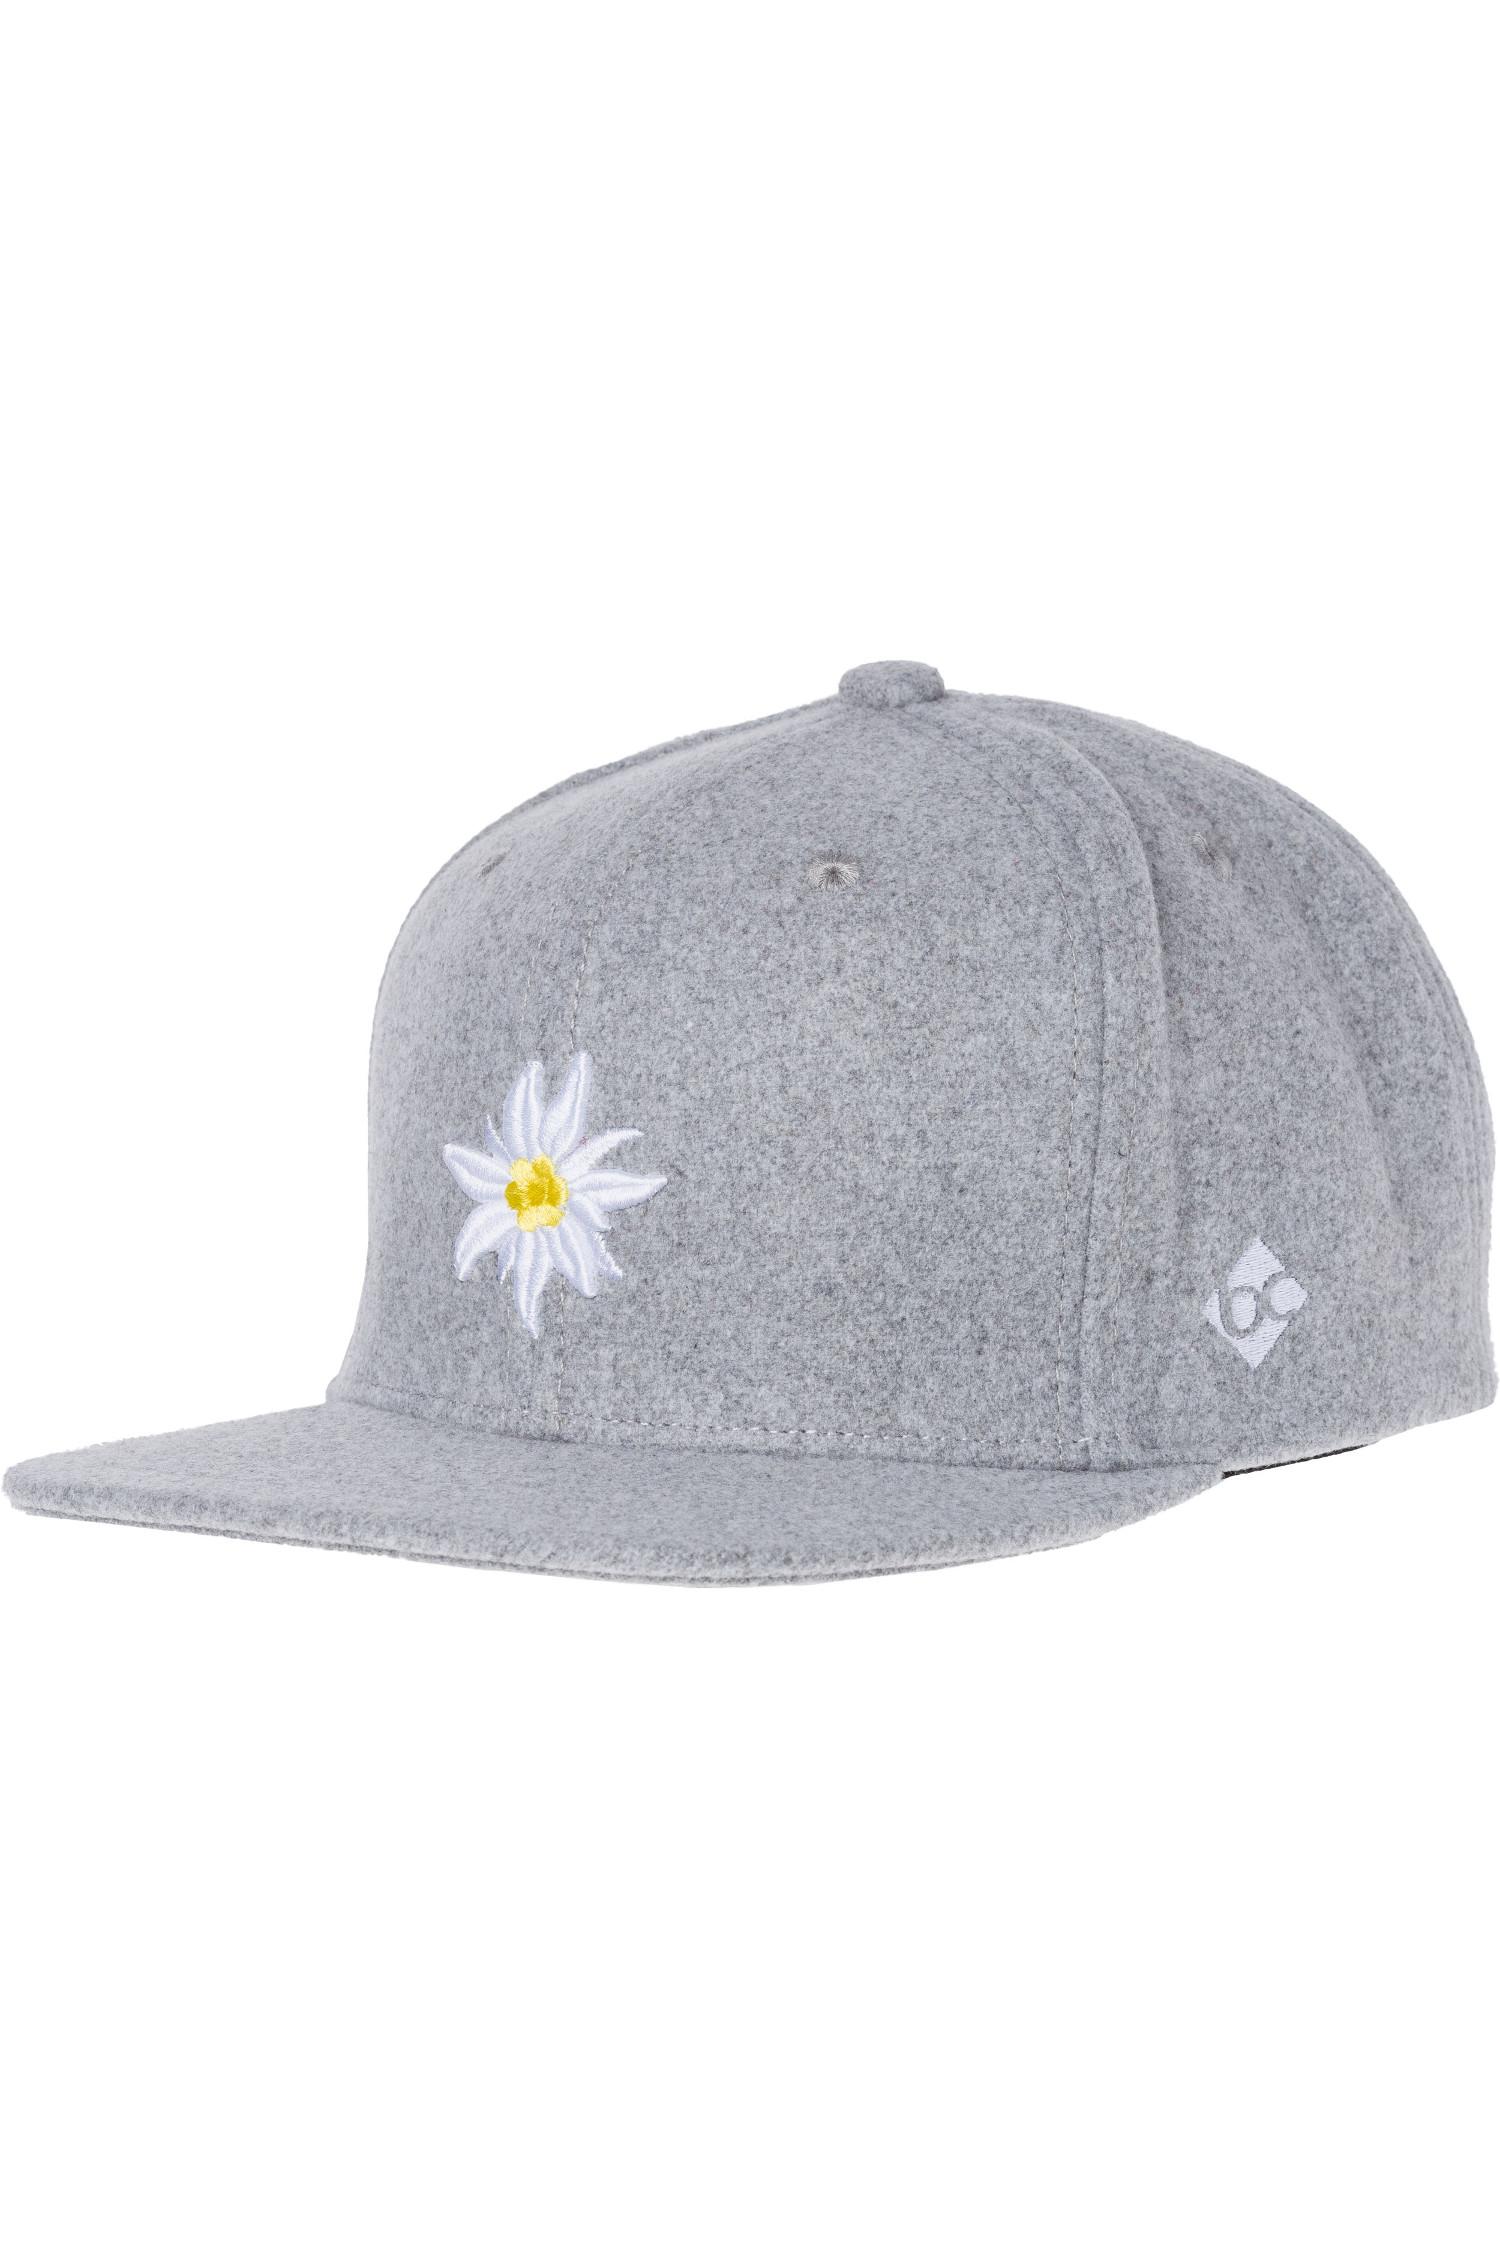 Edelweiss Bavarian Cap